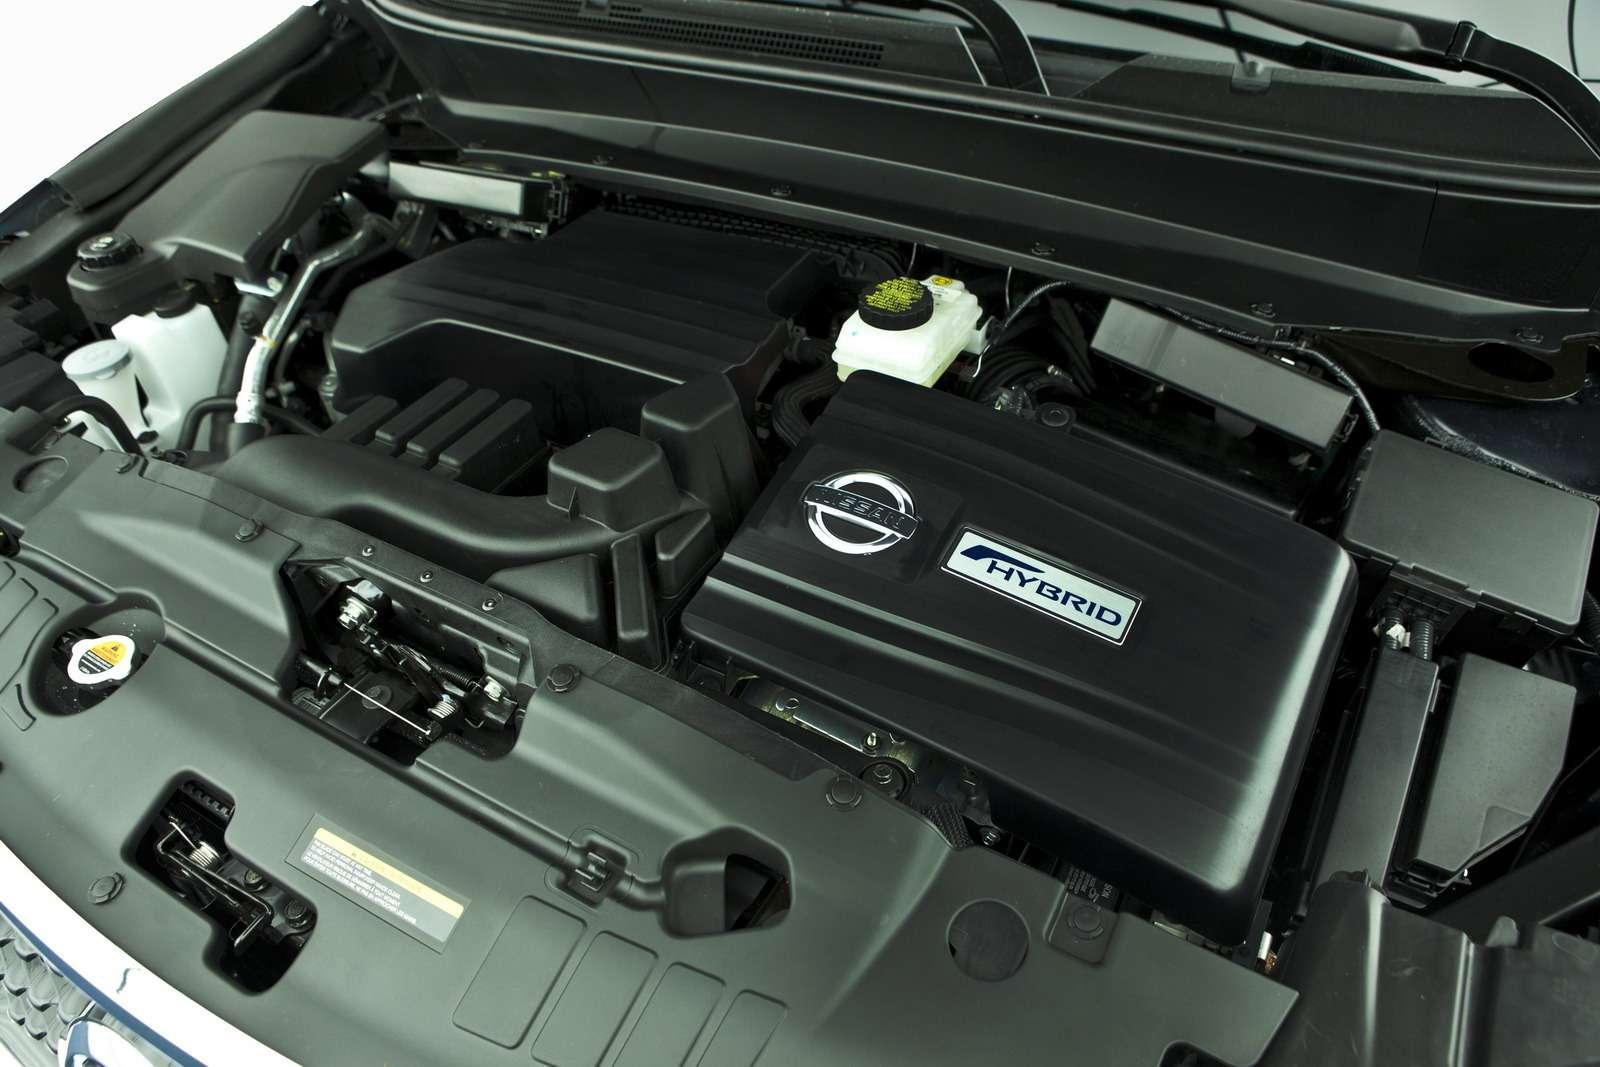 2014 Nissan Pathfinder Hybrid Offers 26MPG Combined Fuel Econom